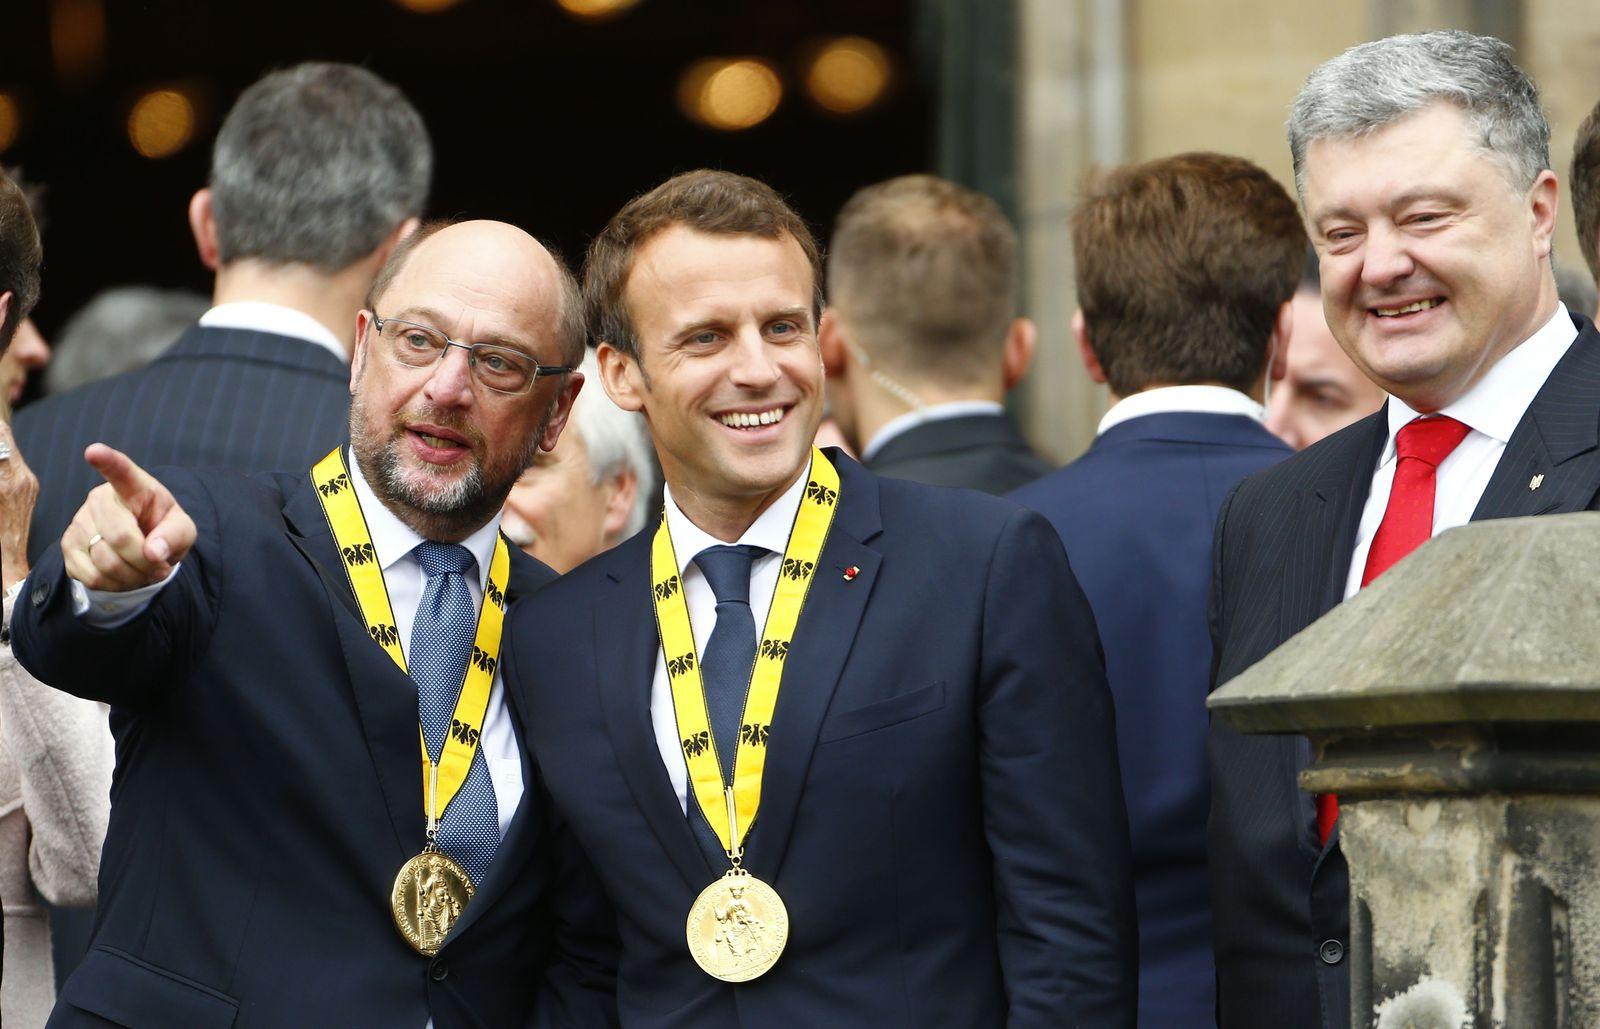 Emmanuel Macron/ Karlspreis